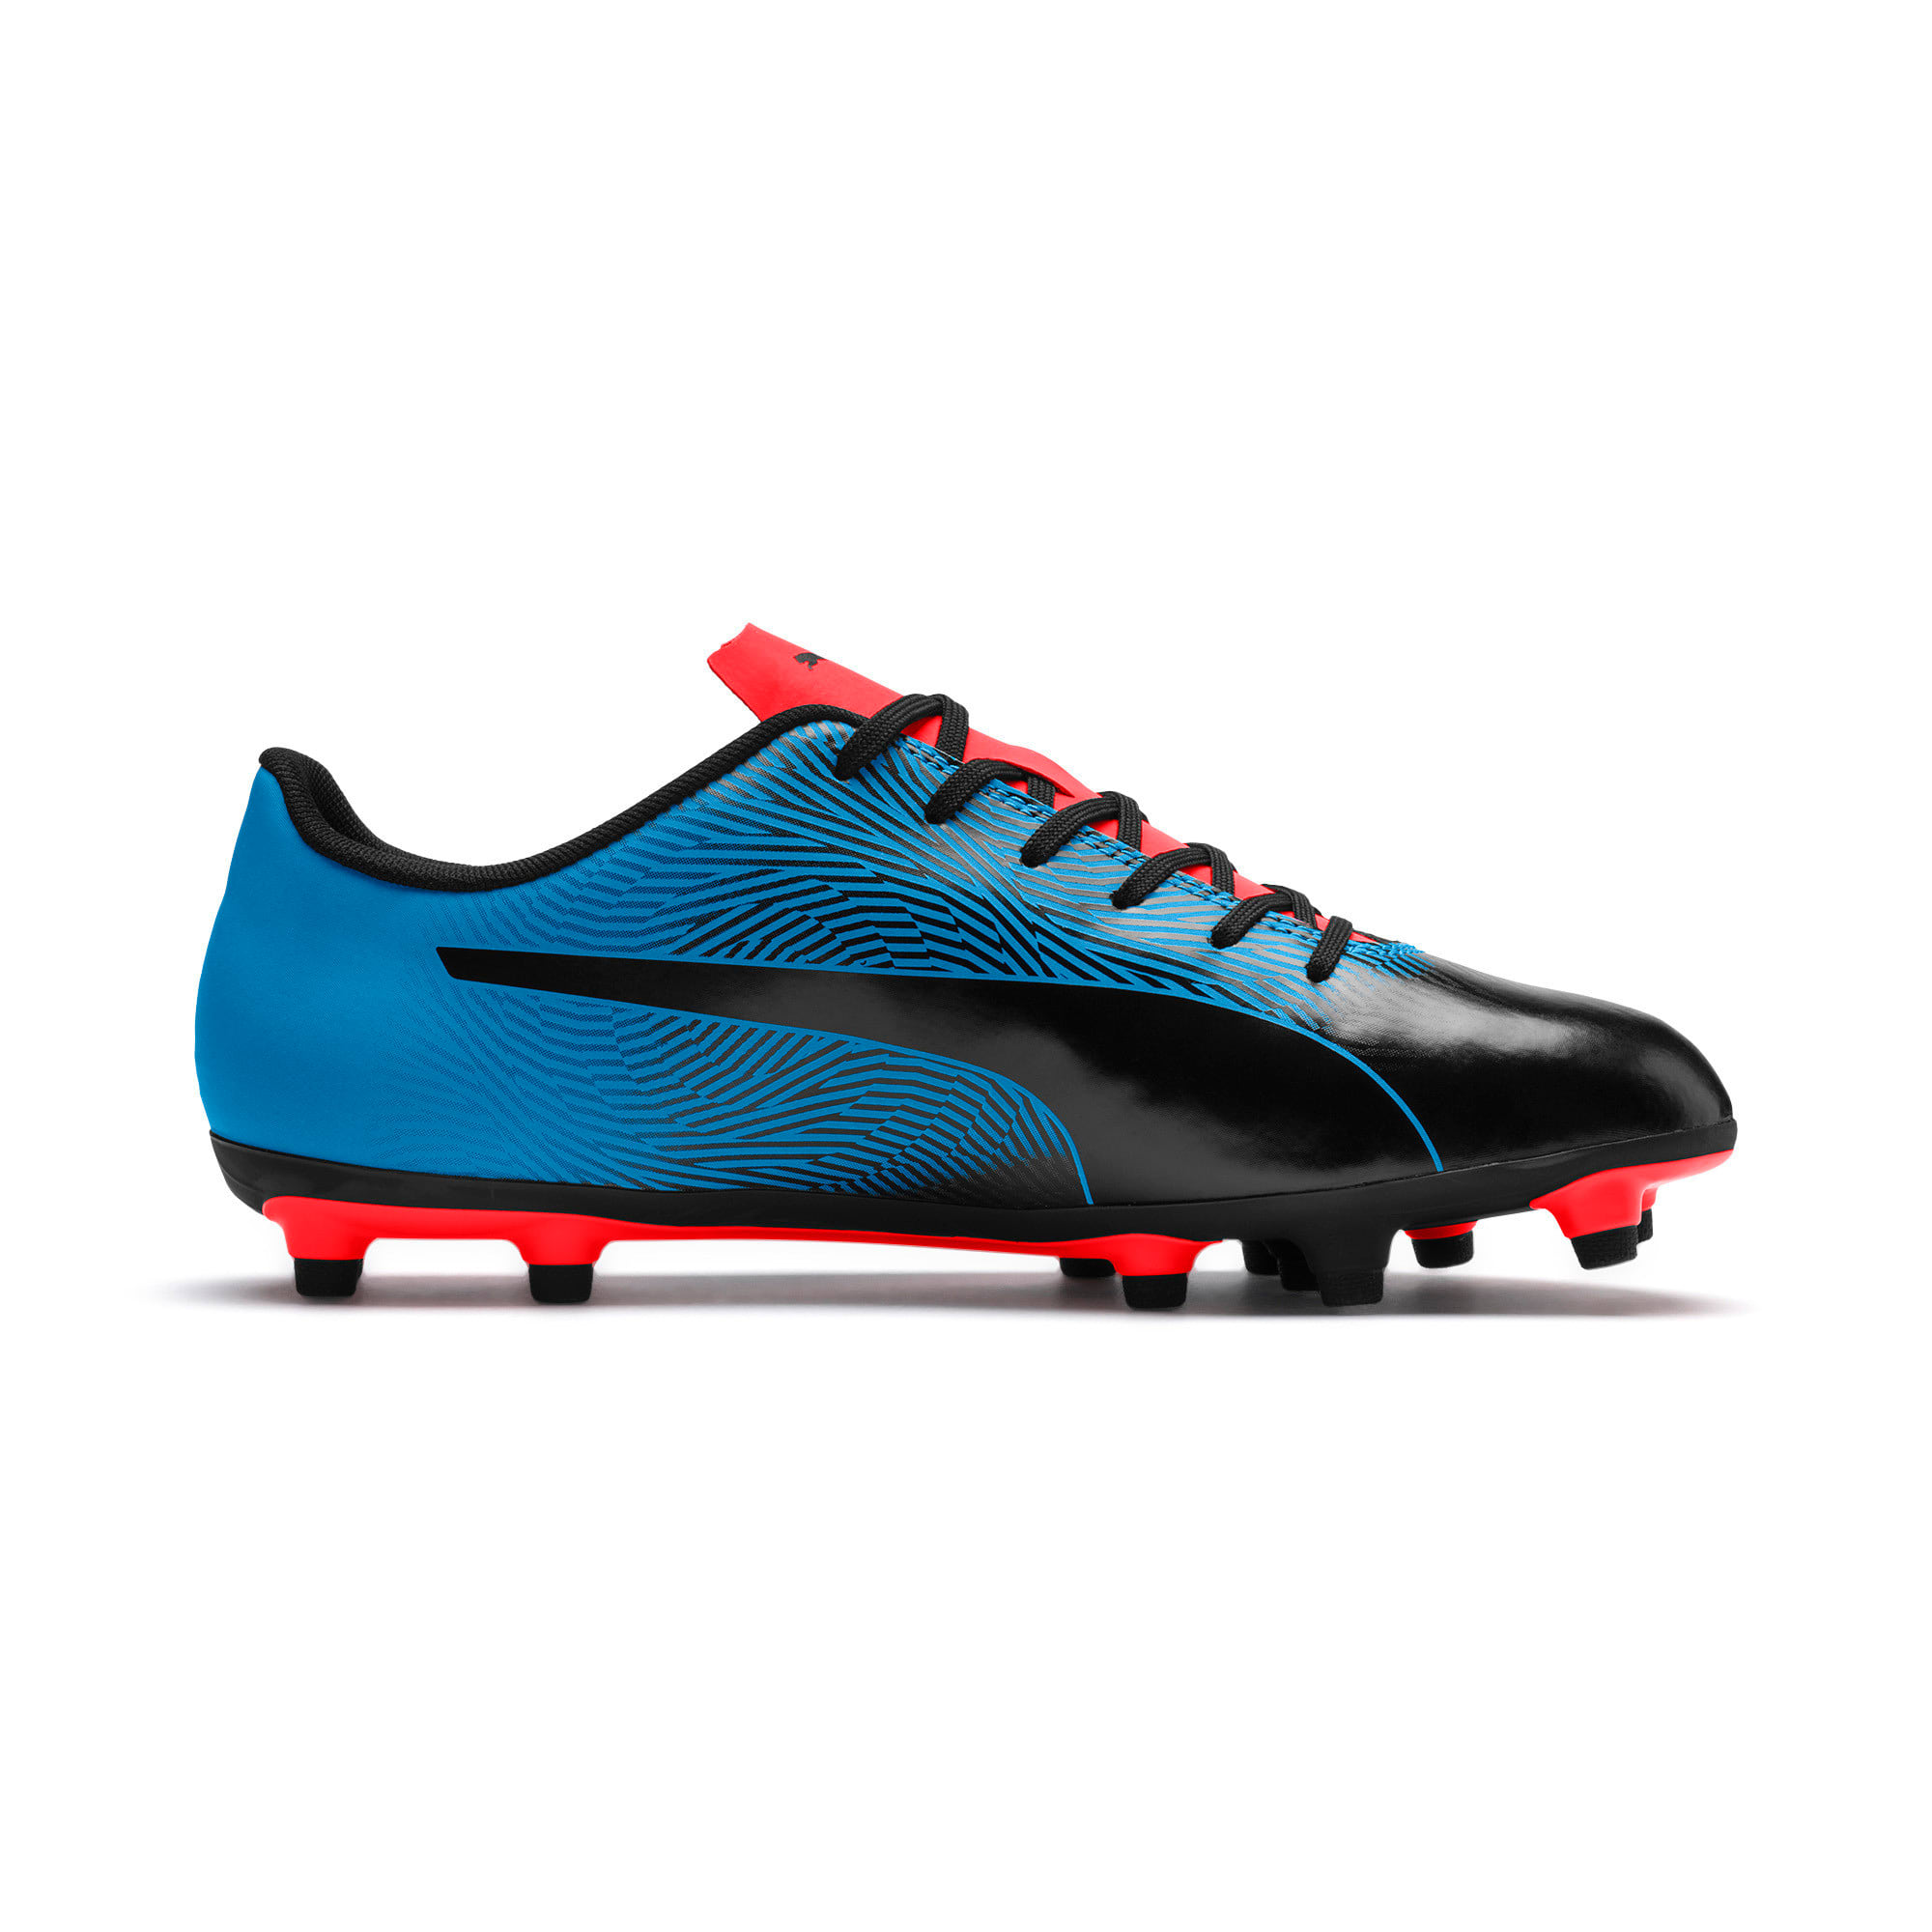 Miniatura 5 de Botines de fútbol PUMA Spirit II FG para hombre, Black-Bleu Azur-Red Blast, mediano